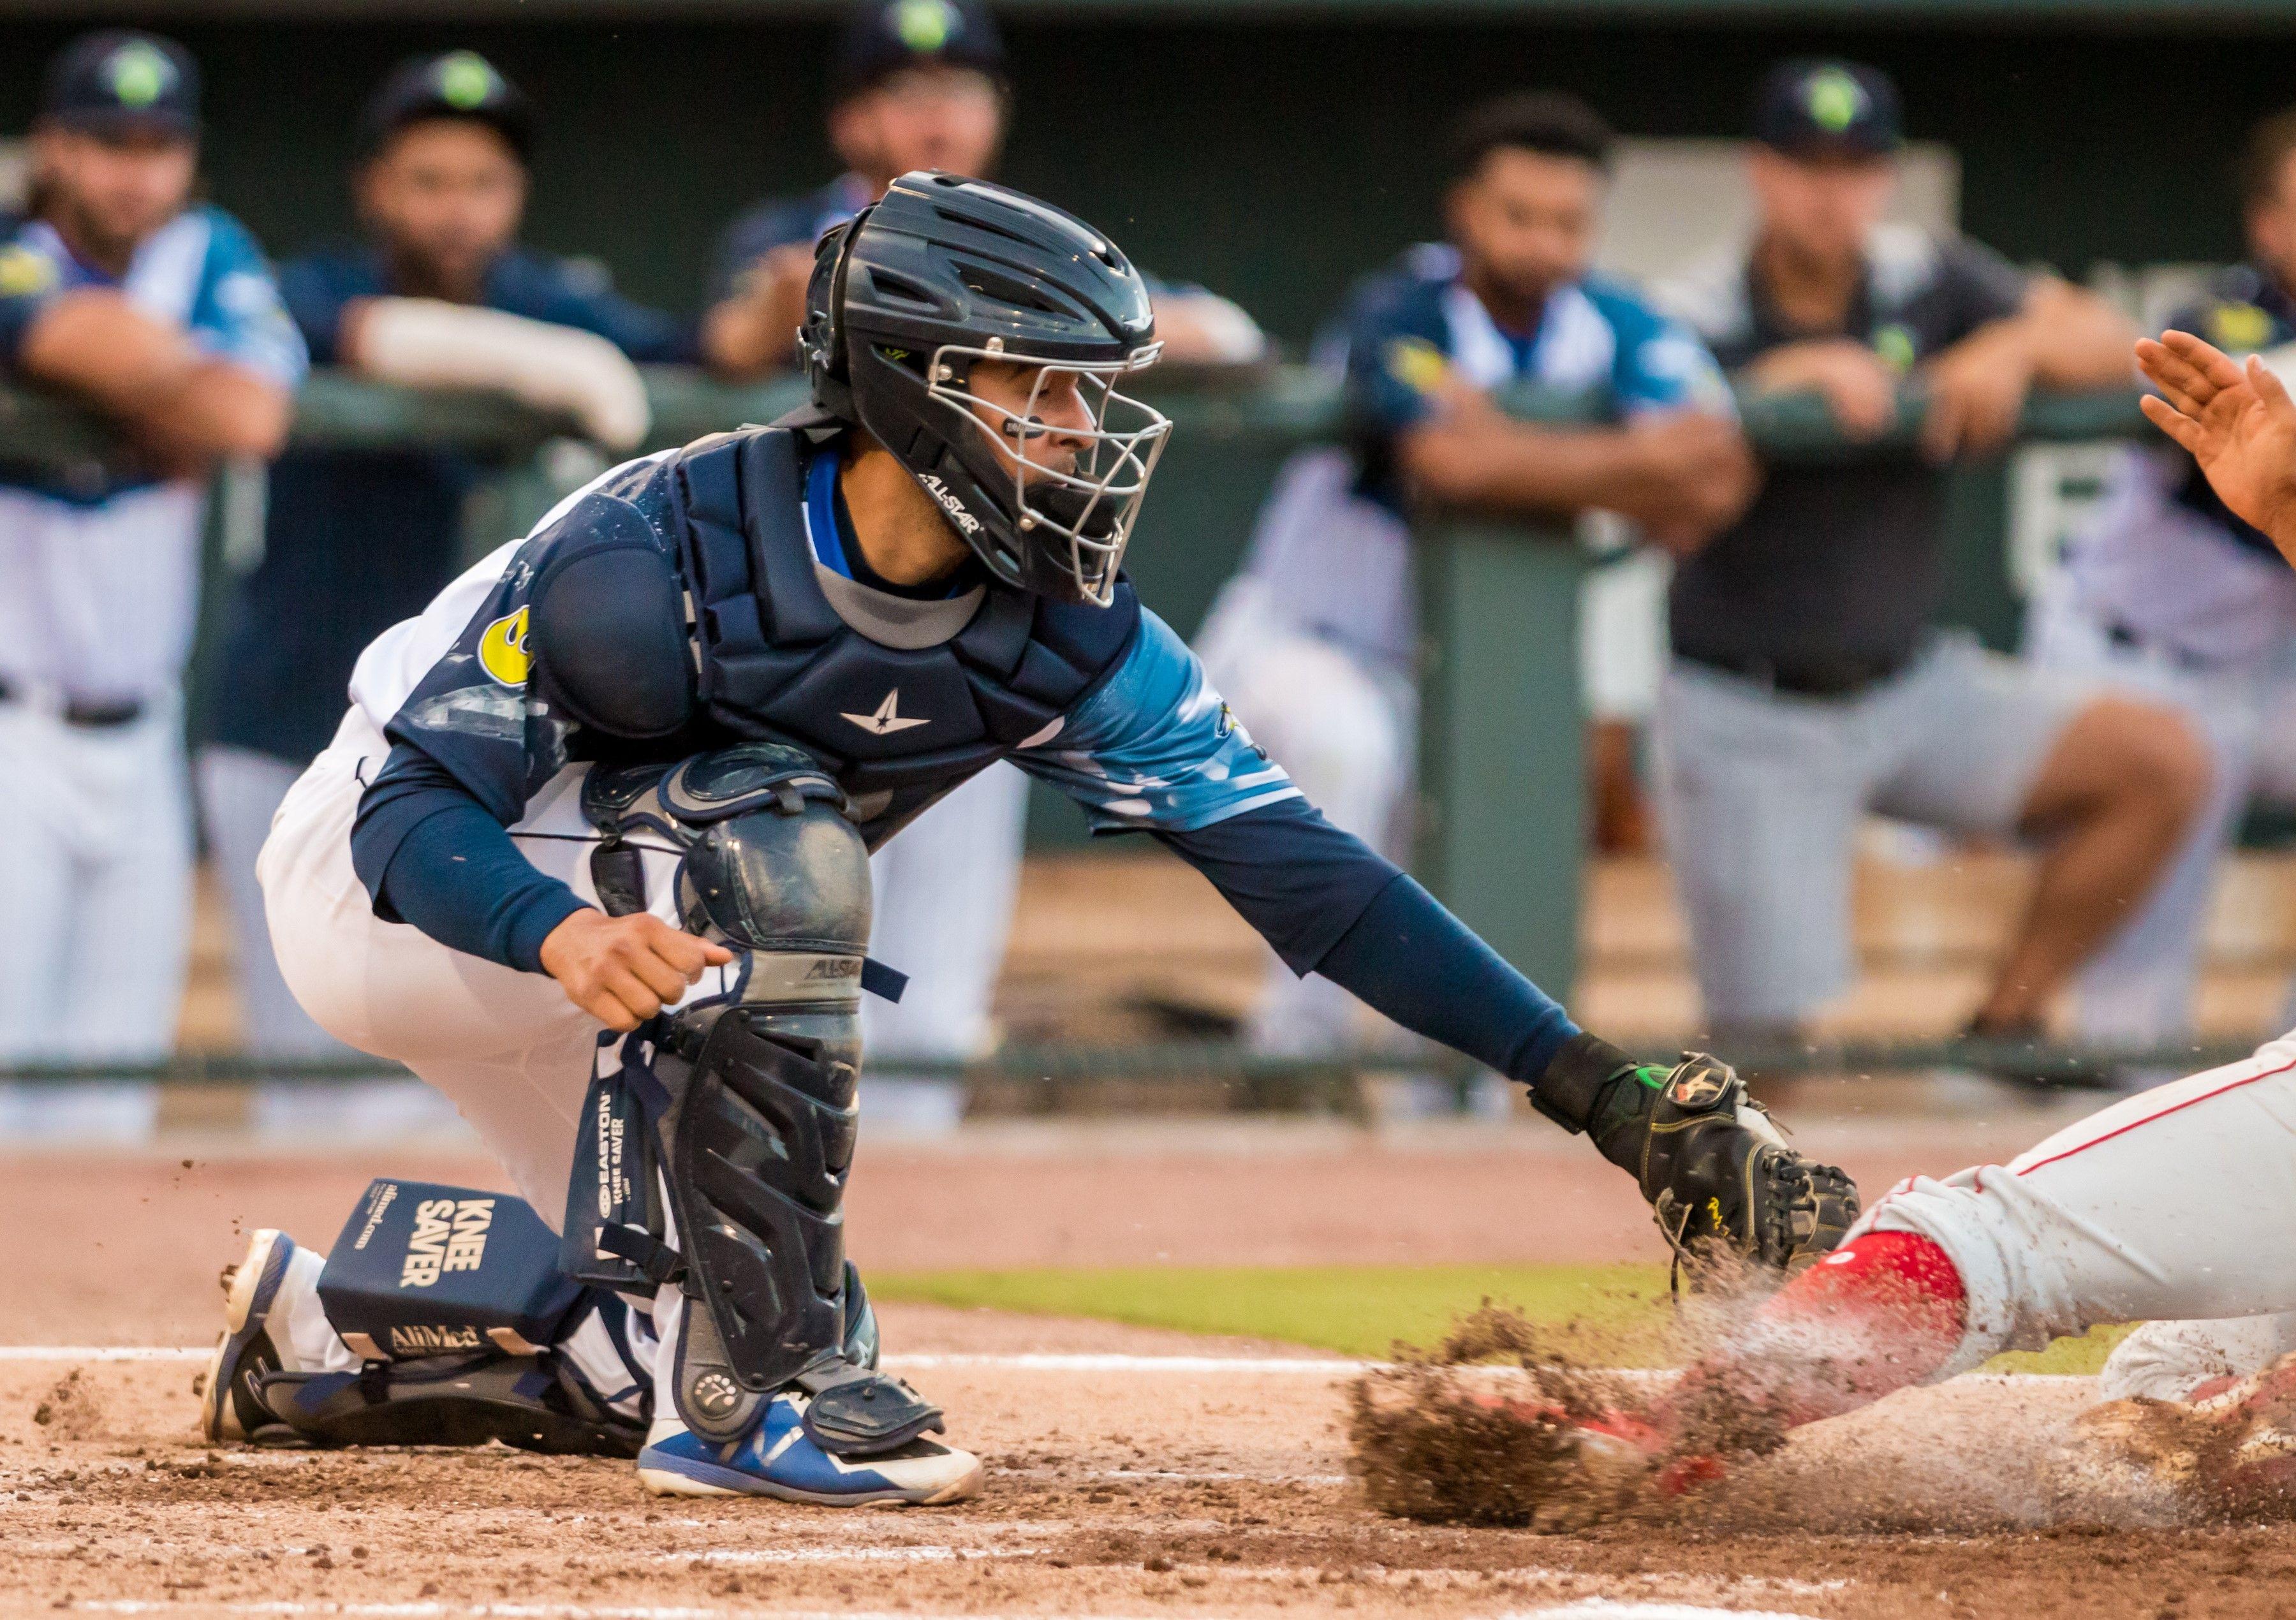 Ex Cyclone Ali Sanchez Makes His Mlb Debut Versus Nationals In 2020 New York Mets Debut Cyclone